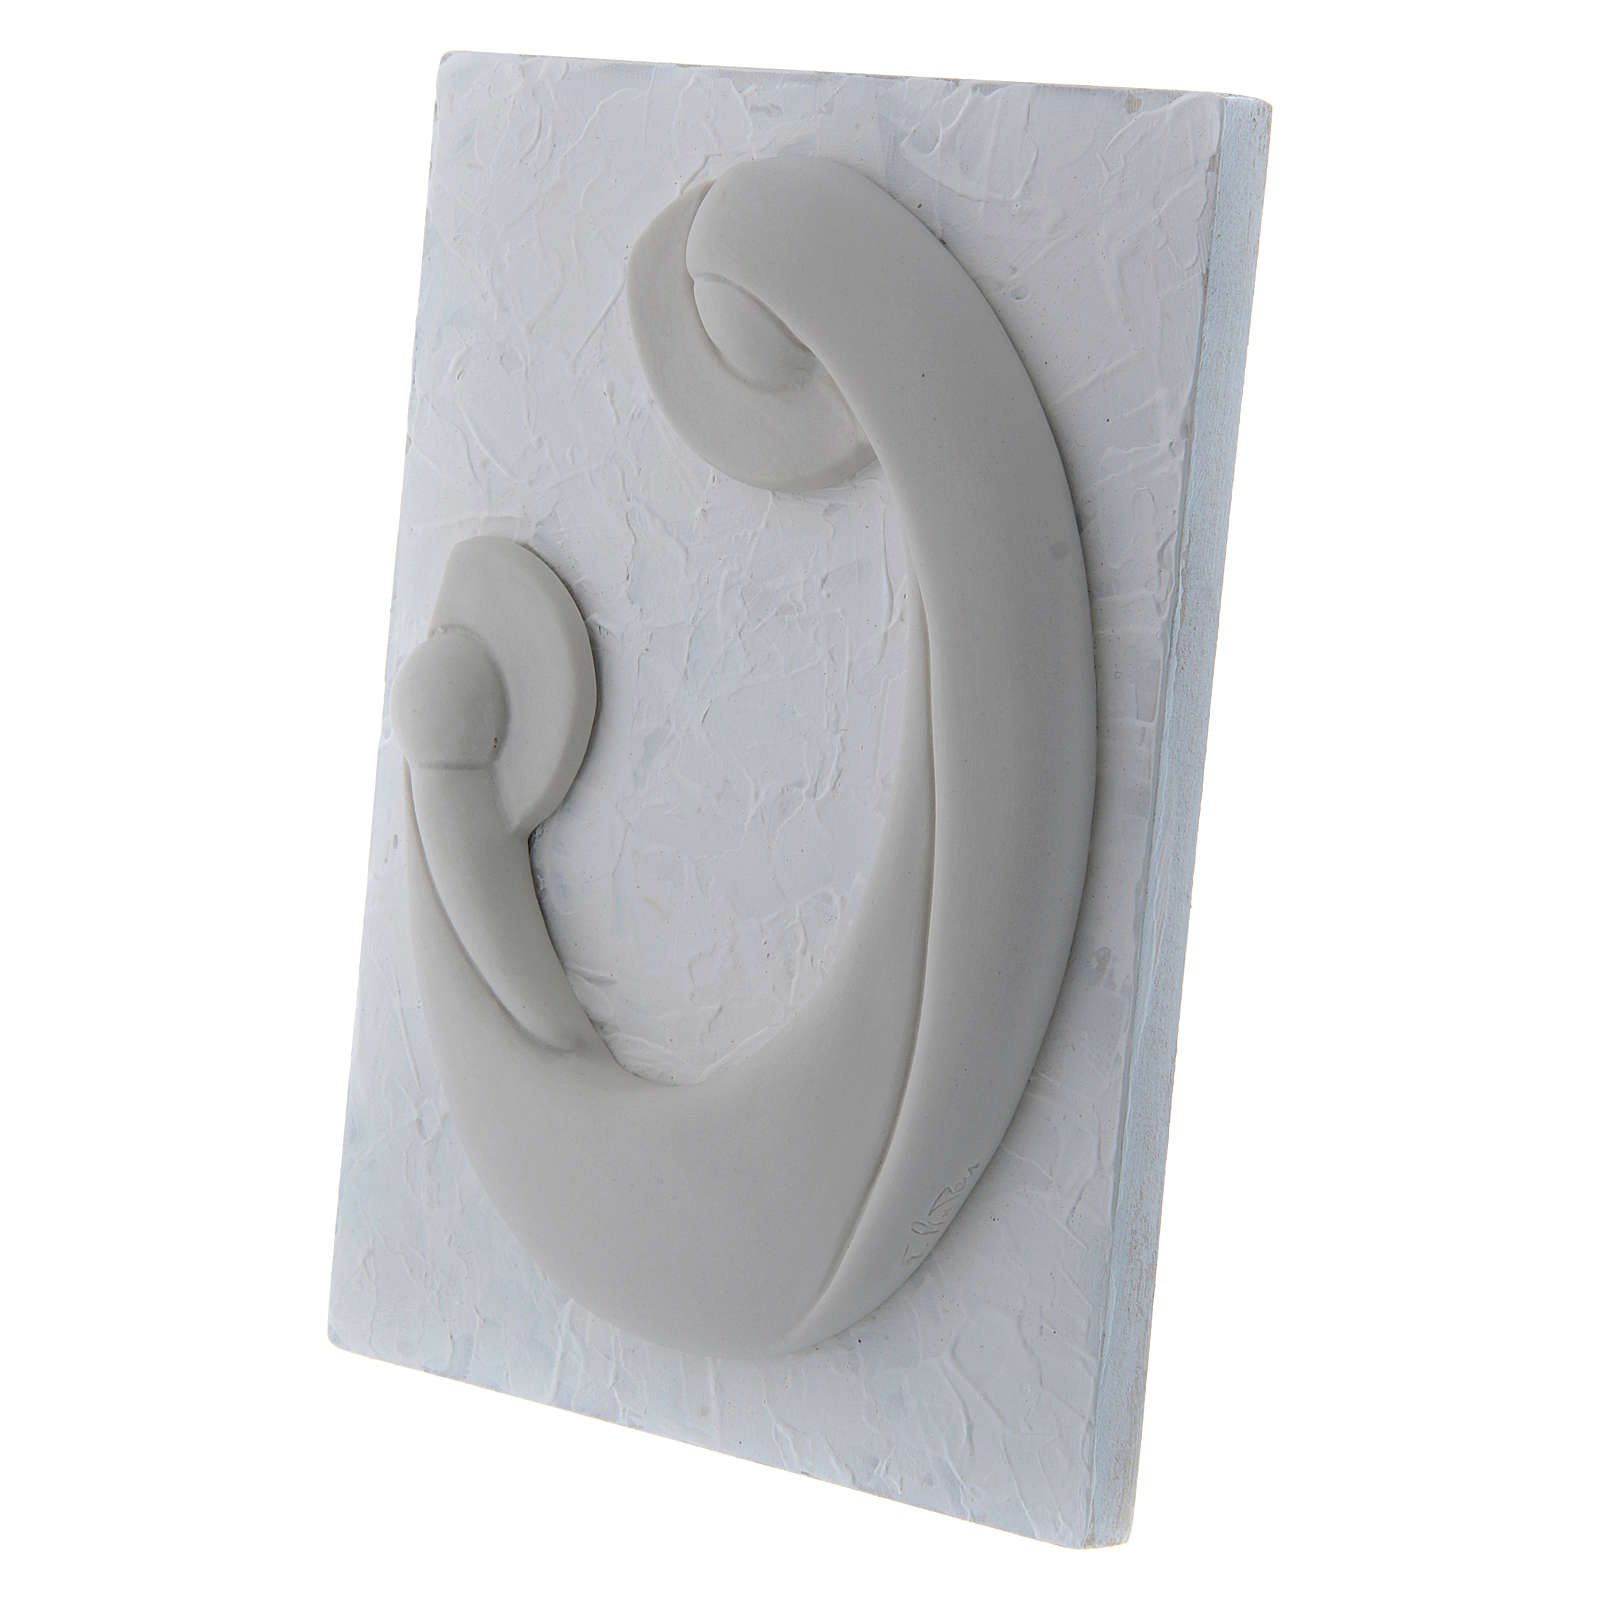 Bajorrelieve de porcelana blanca Virgen Niño panel blanco Pinton 17x13 cm 4